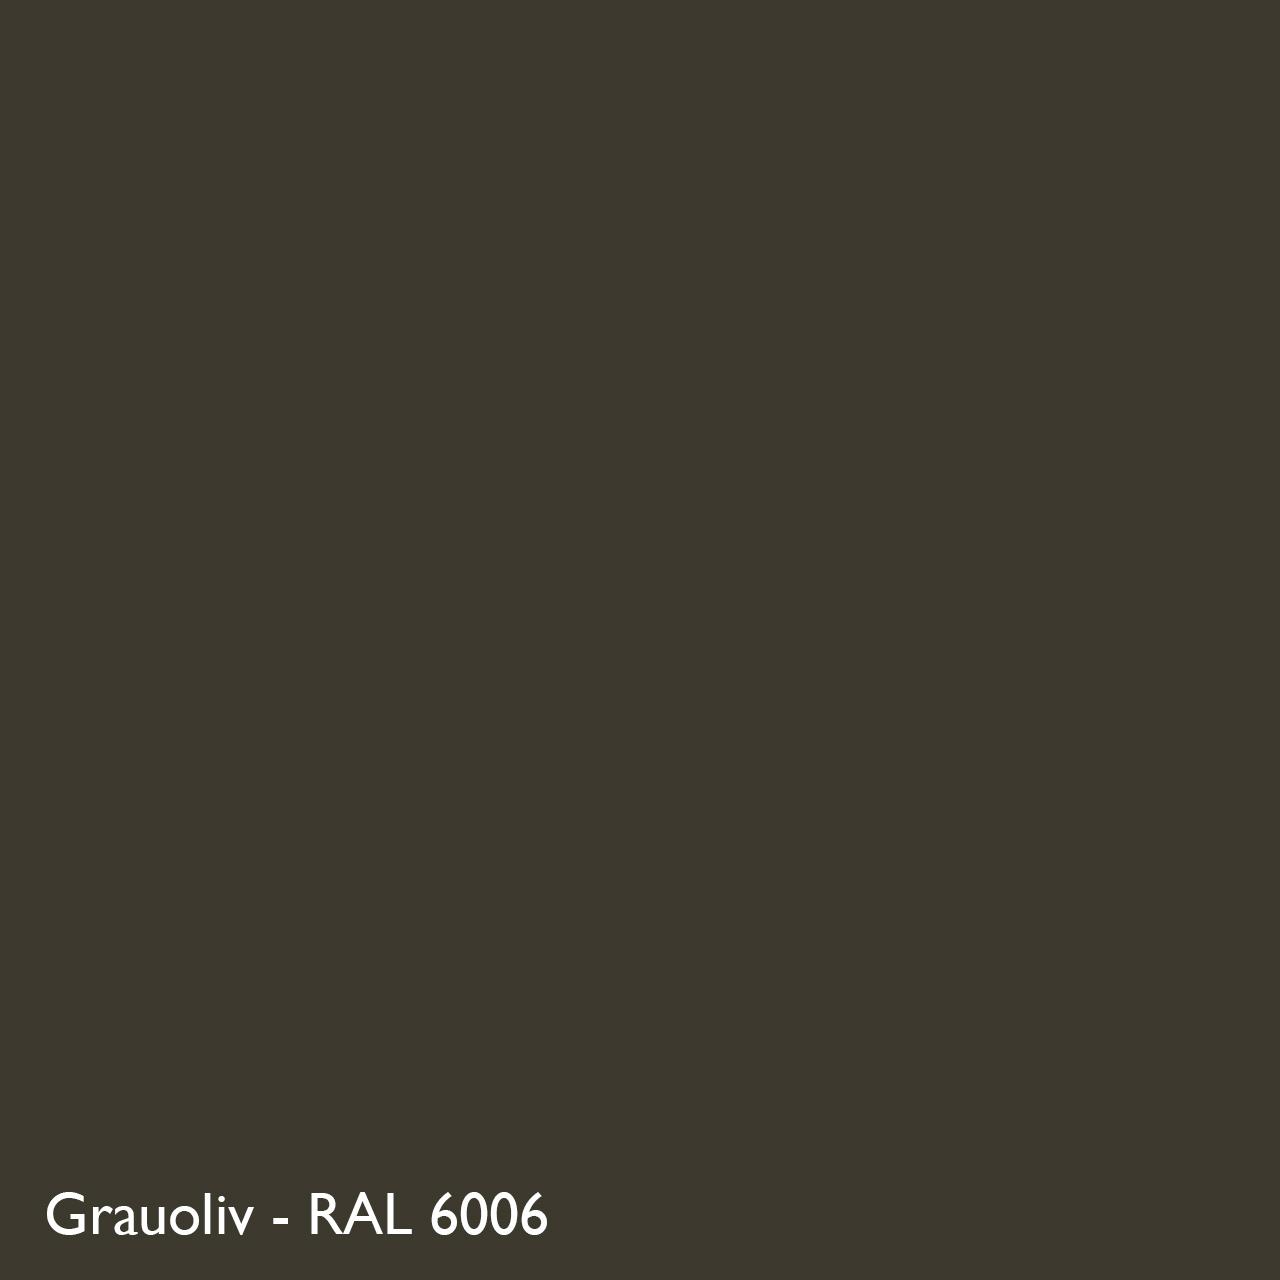 Farbkachel Manufakt Grauoliv - RAL 6006